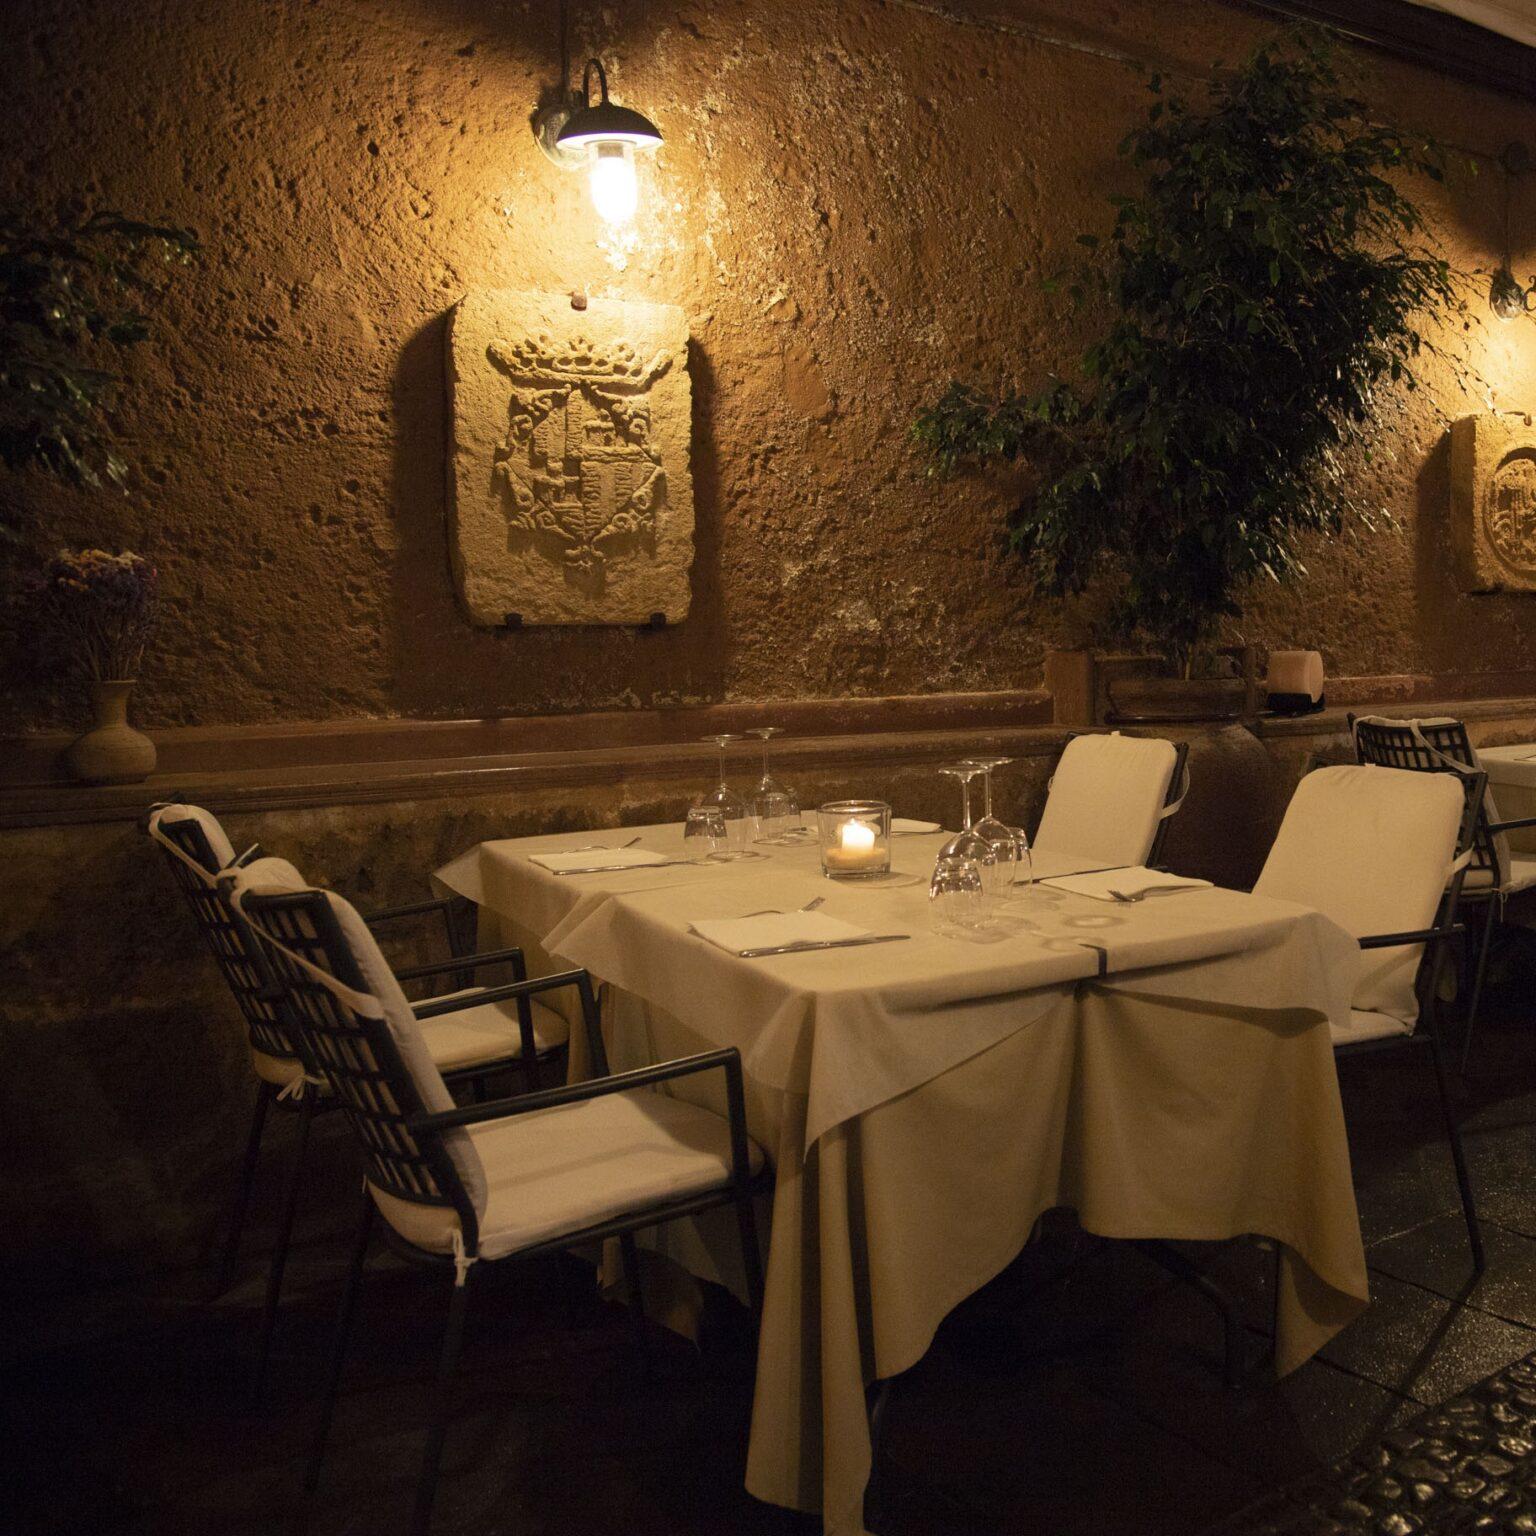 Interno della sala del ristorante Mirador